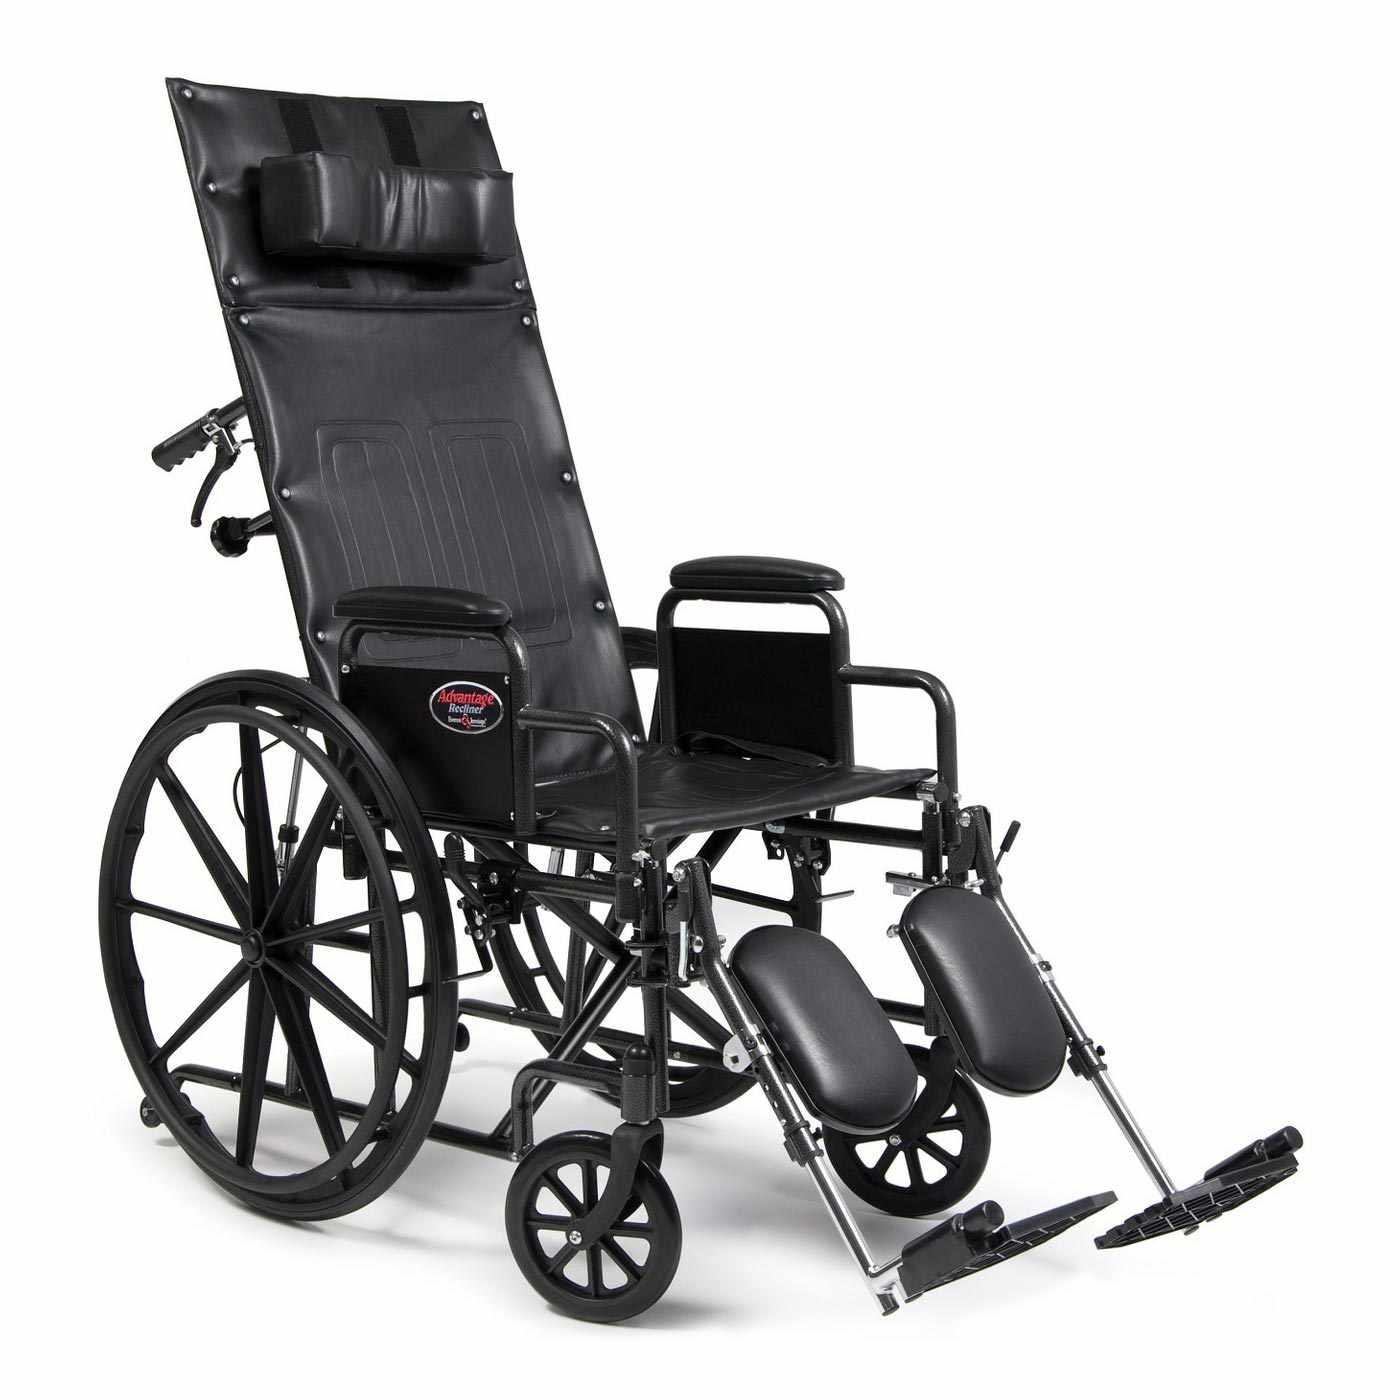 Everest & Jennings advantage recliner wheelchair